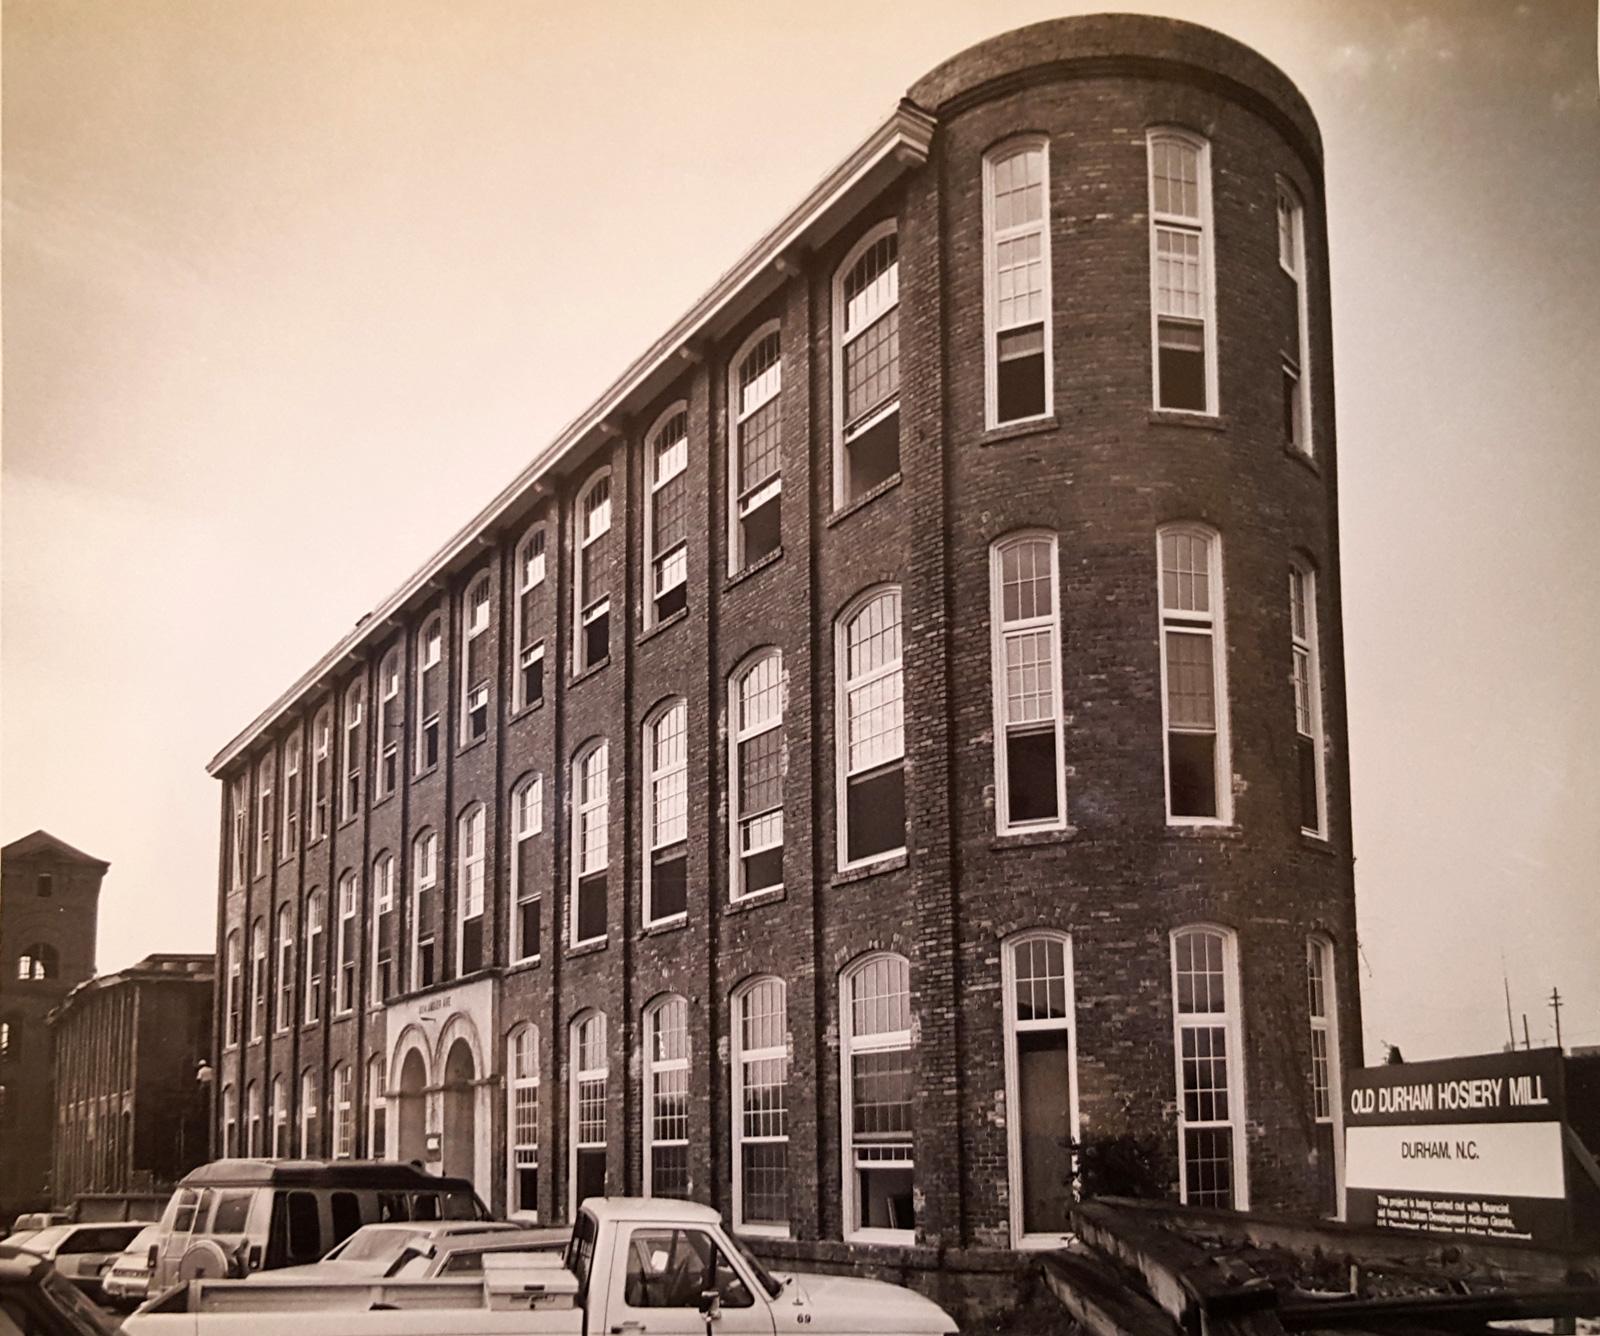 Old Durham Hosiery Mill